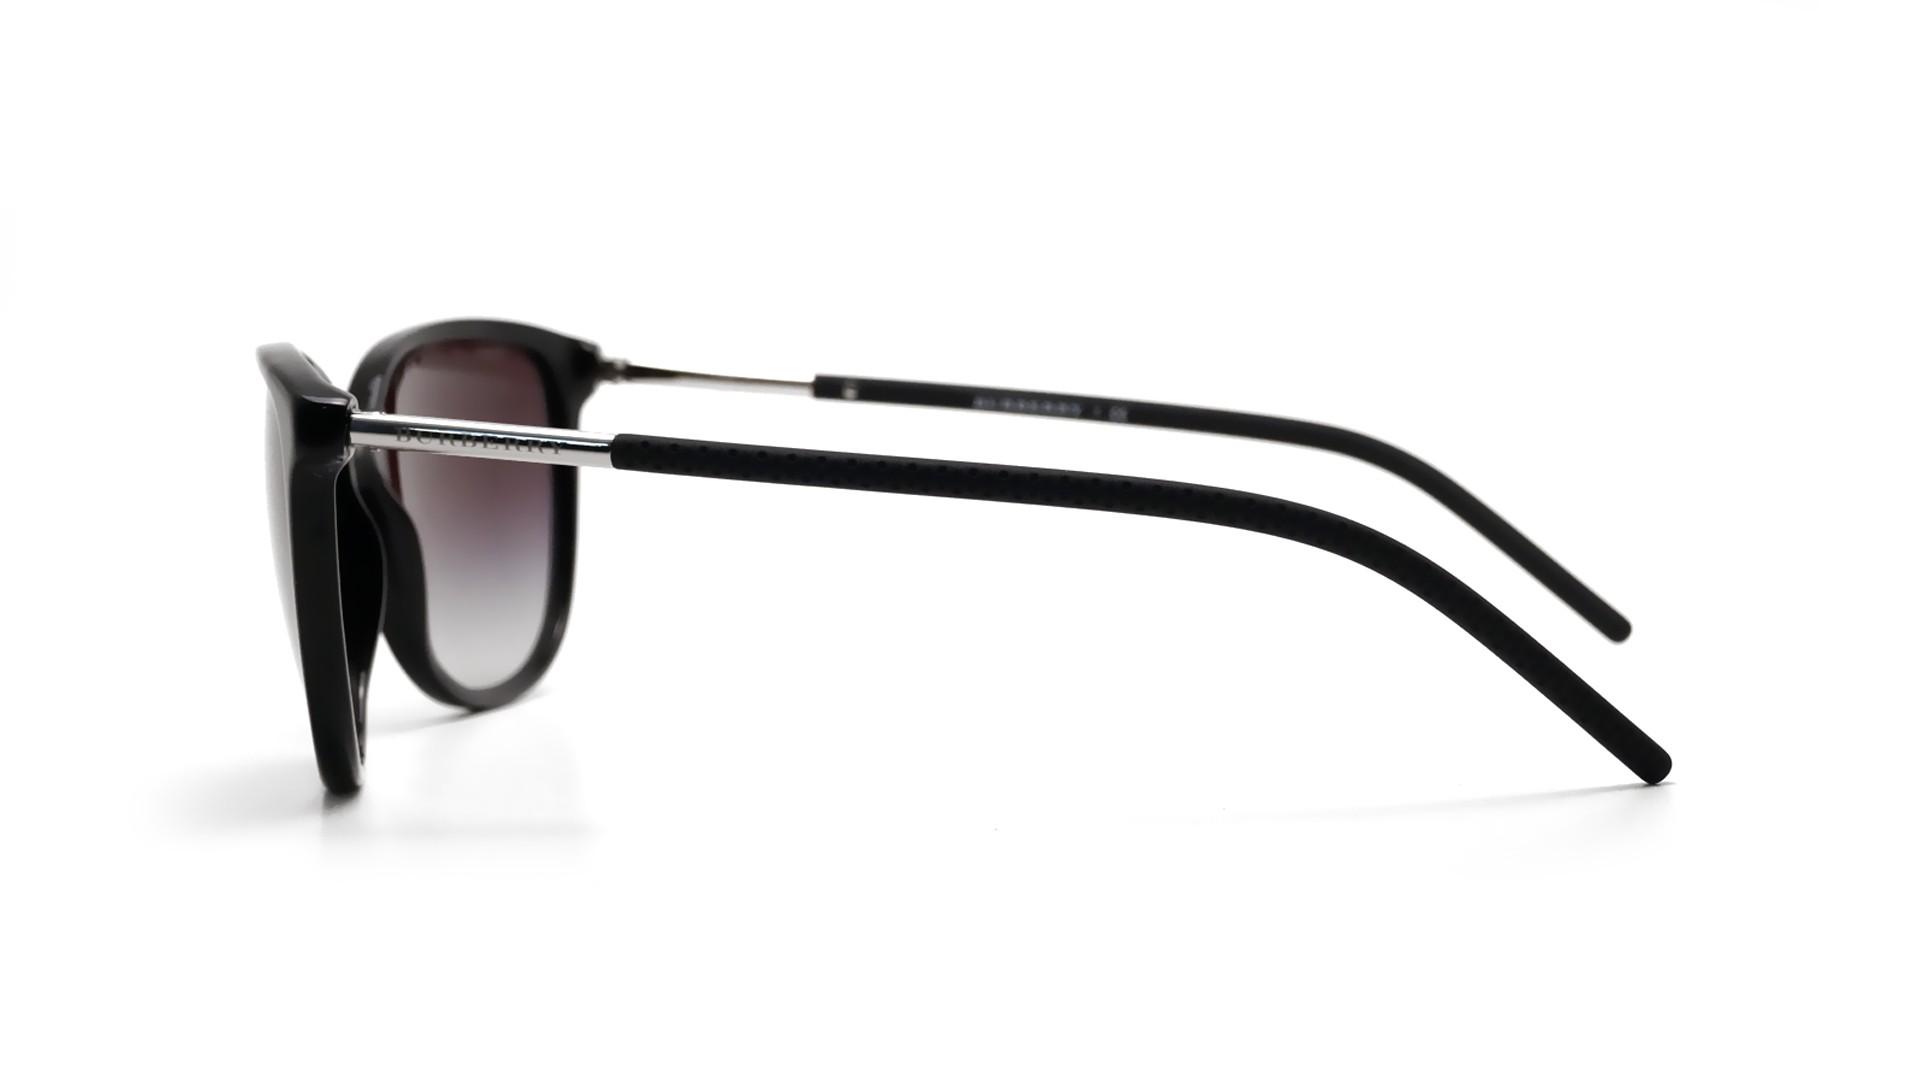 bca25278792 Sunglasses Burberry BE4180 30018g 57-16 Black Large Degraded